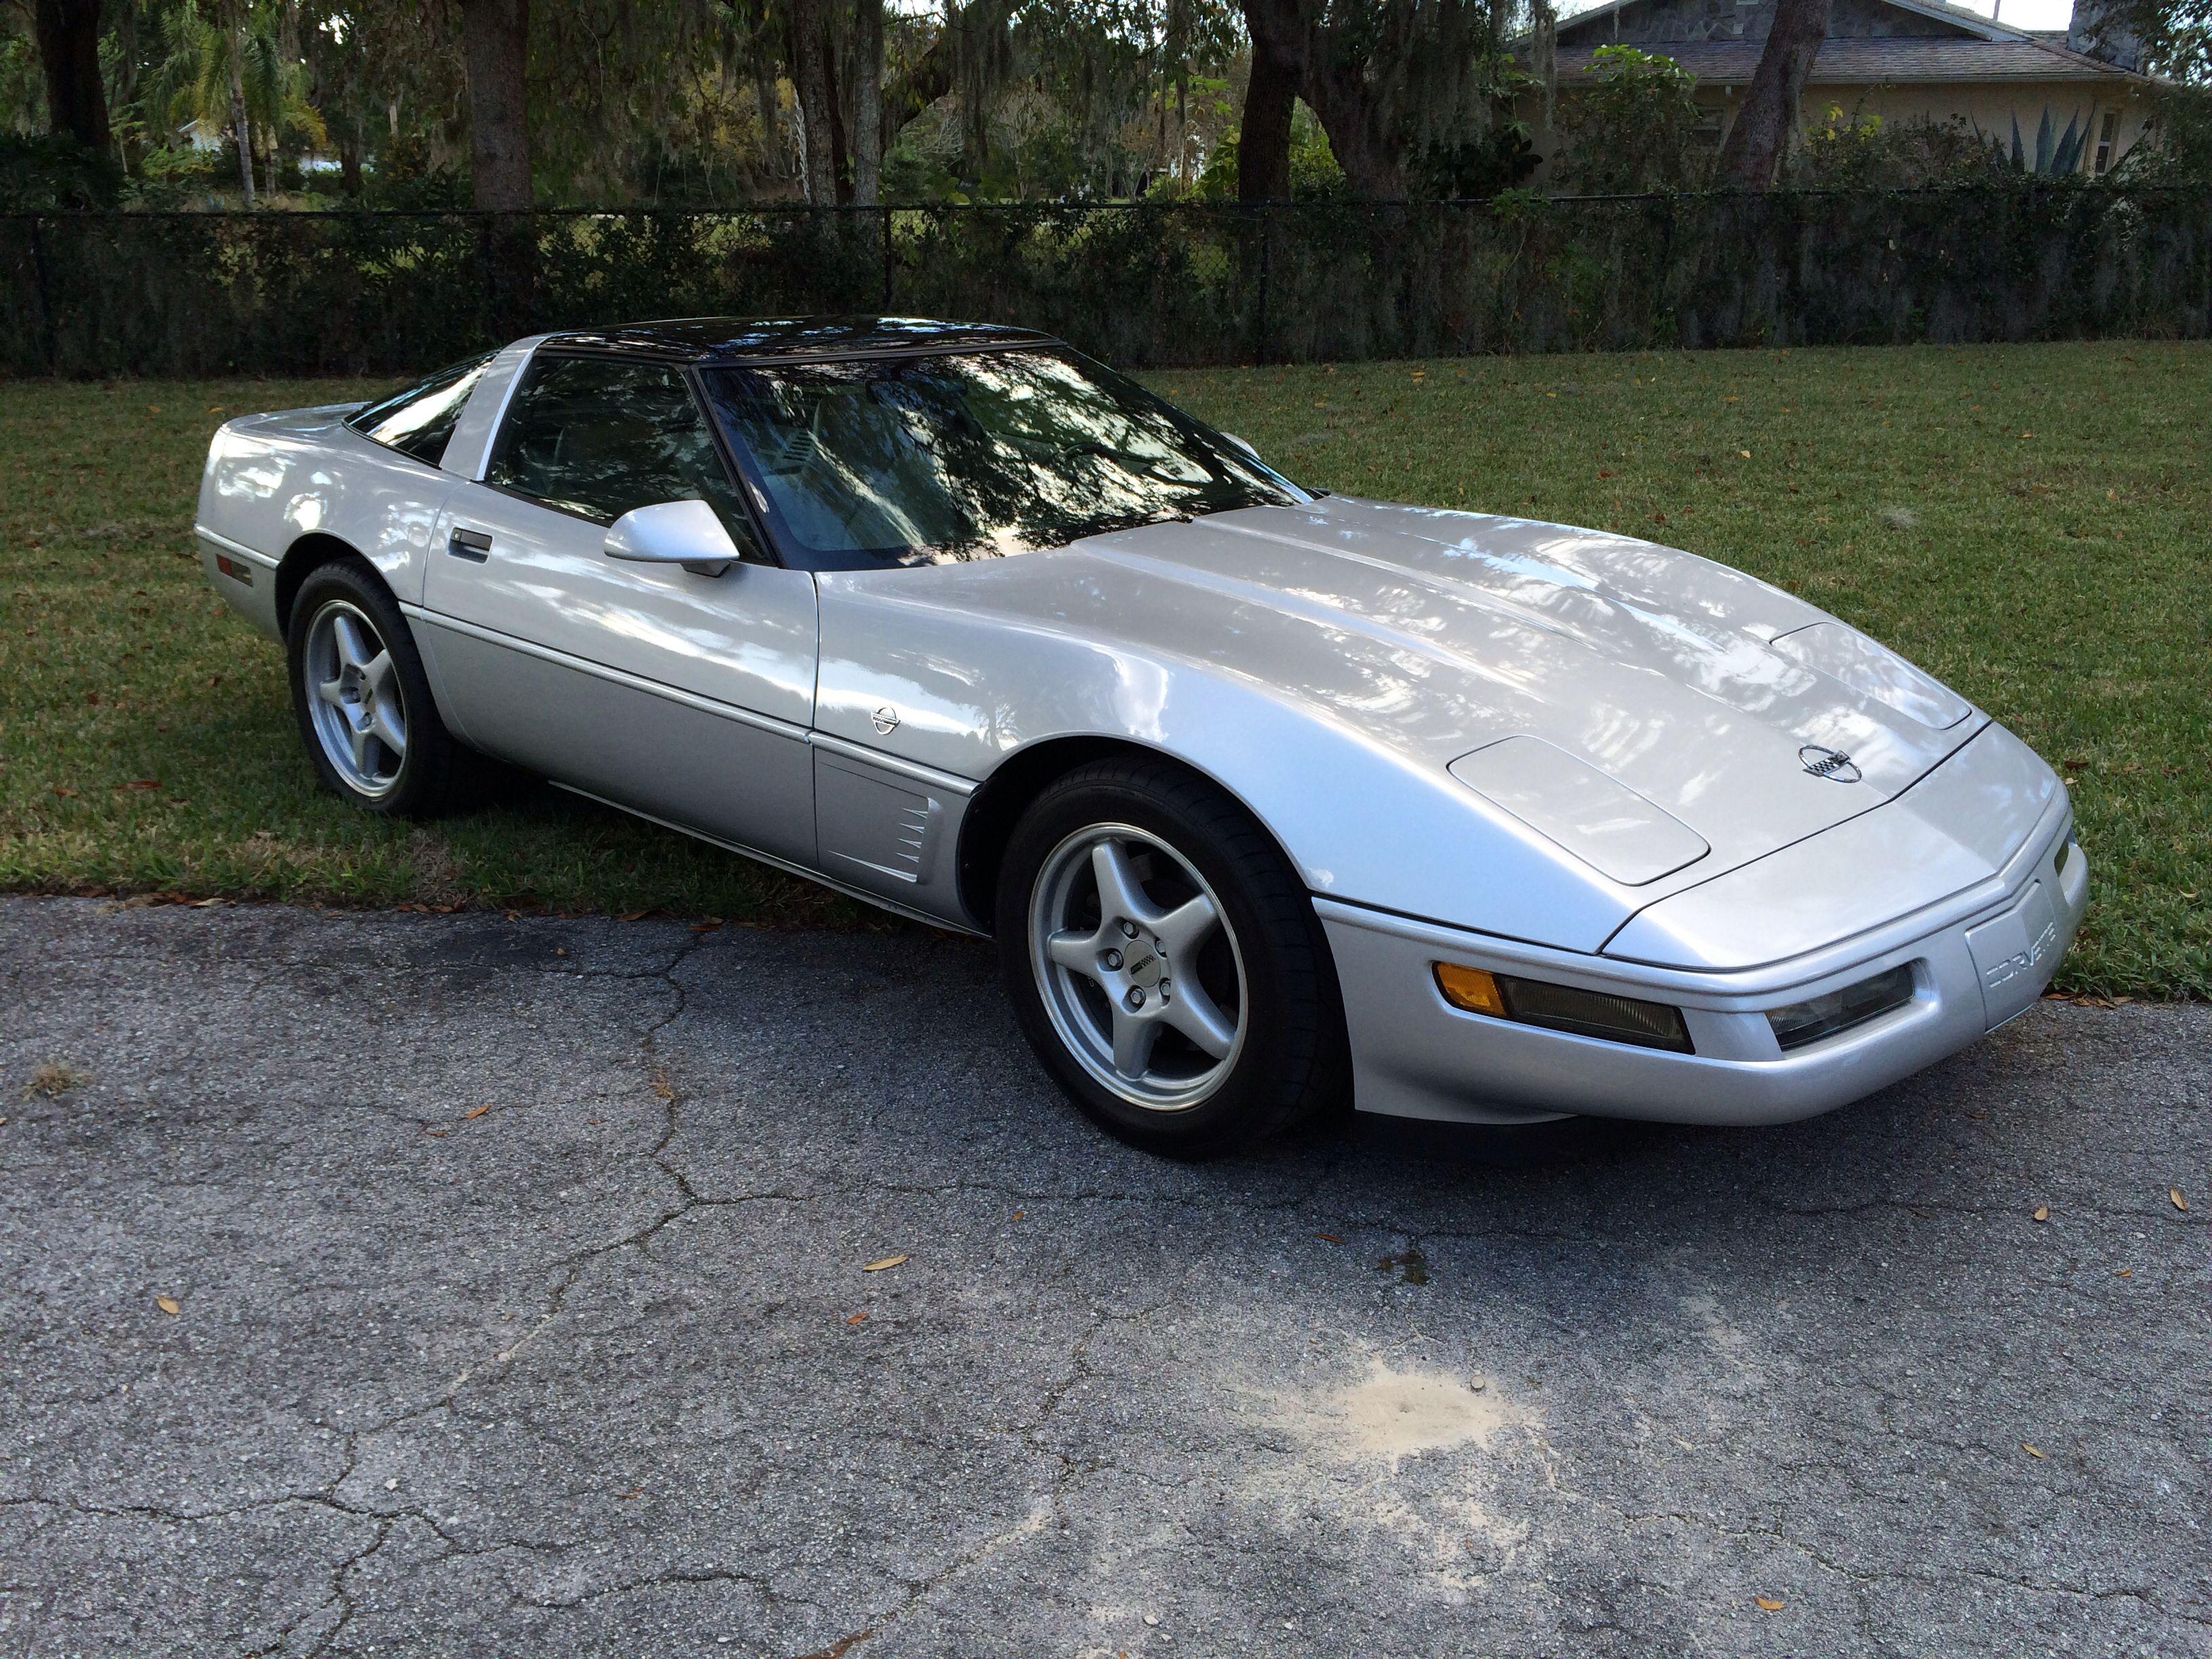 1996 Corvette Classic Corvette 1996 Corvette Corvette History